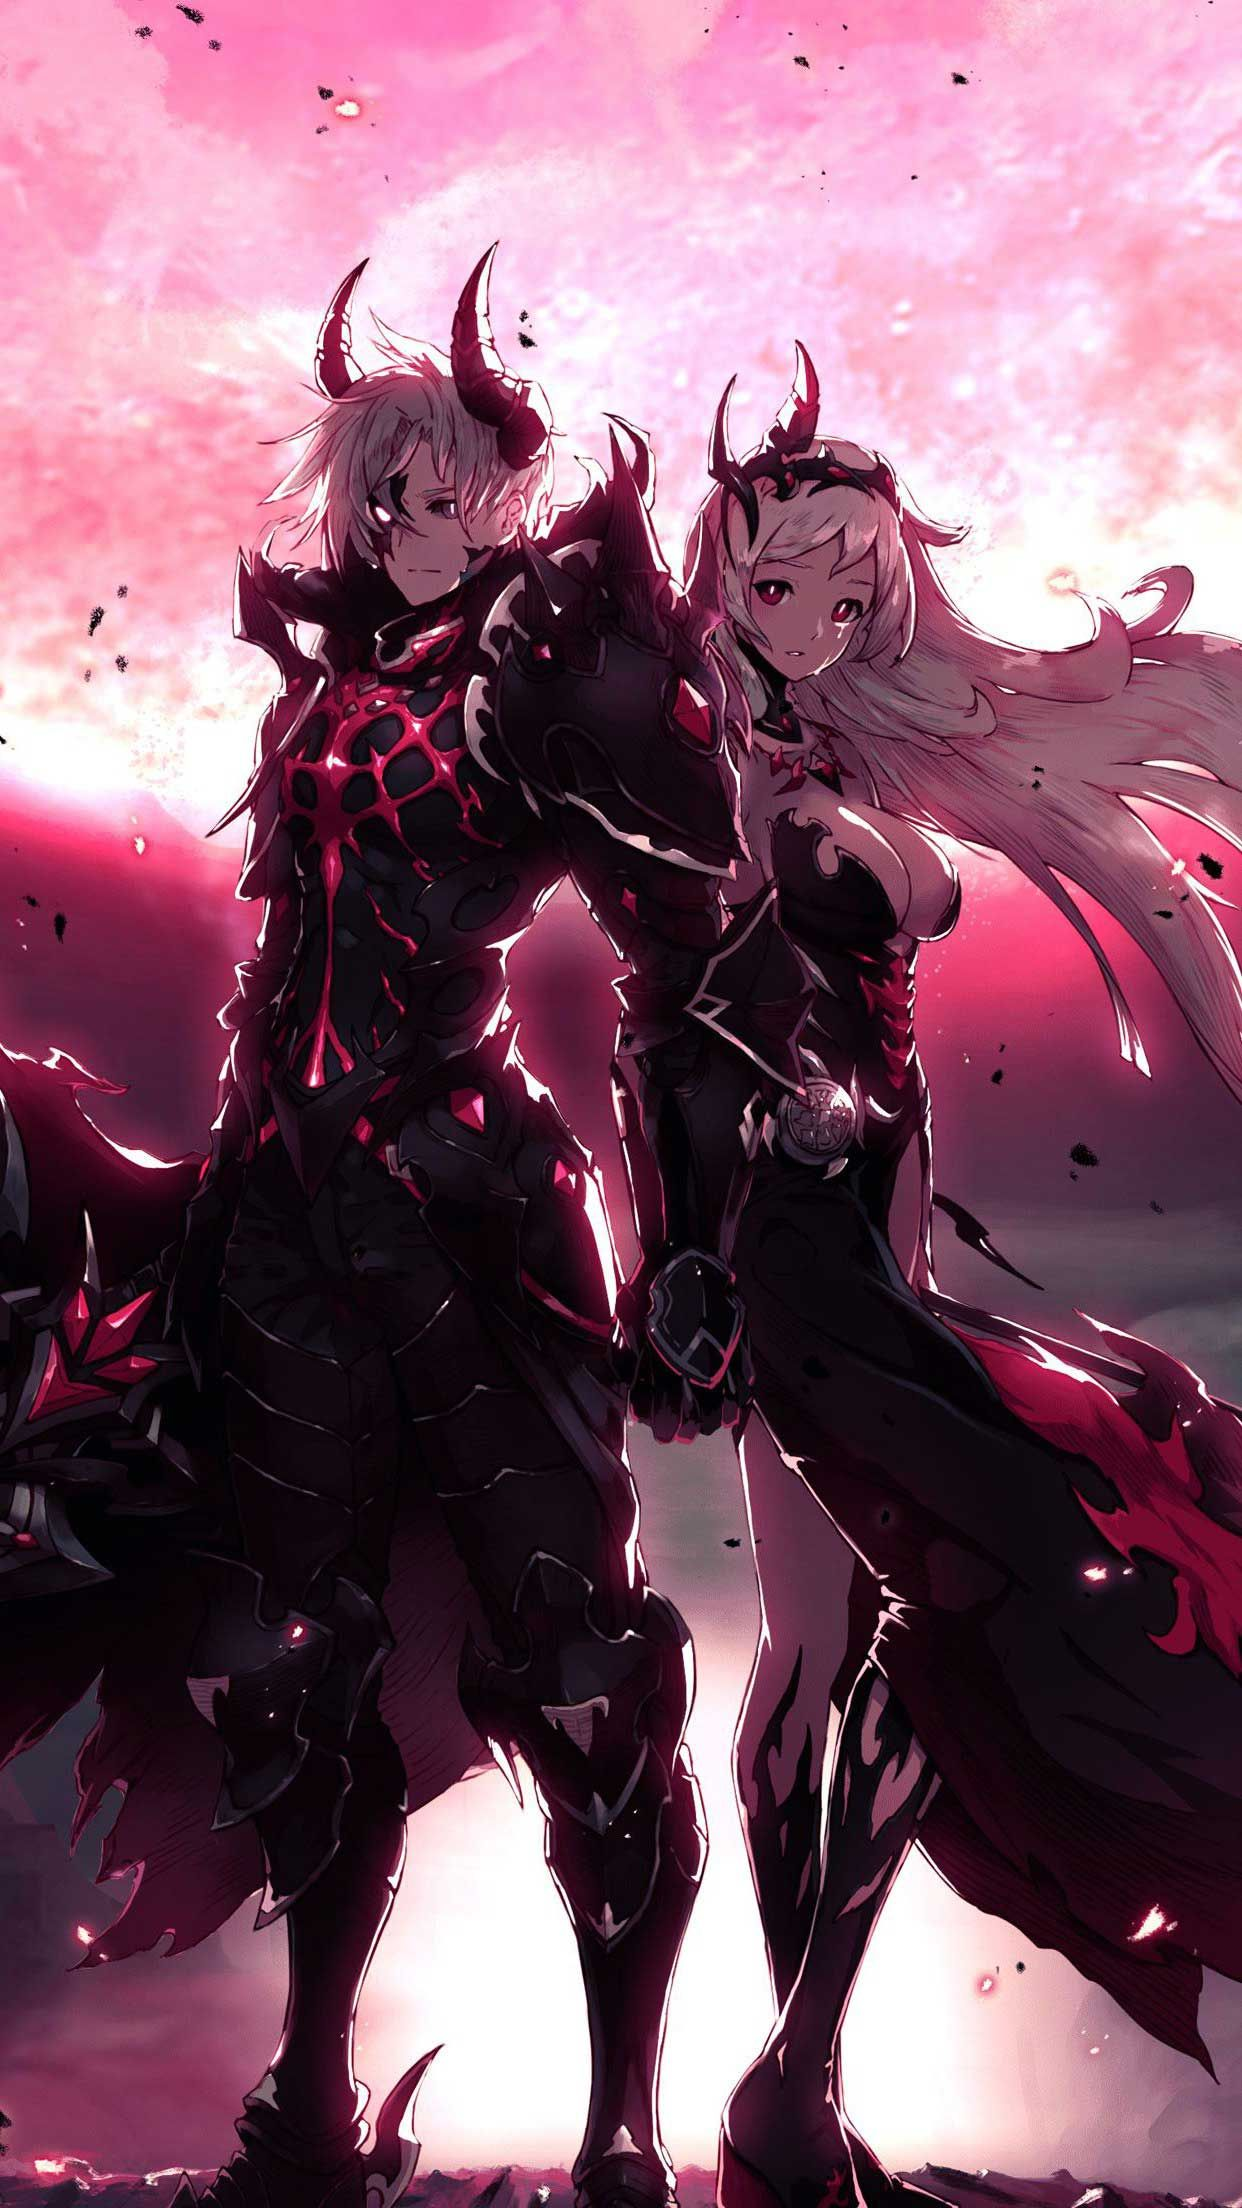 Kings Raid Pandemonium K M Iphone Wallpapers Hd Cool Anime Pictures Anime Character Design Anime King